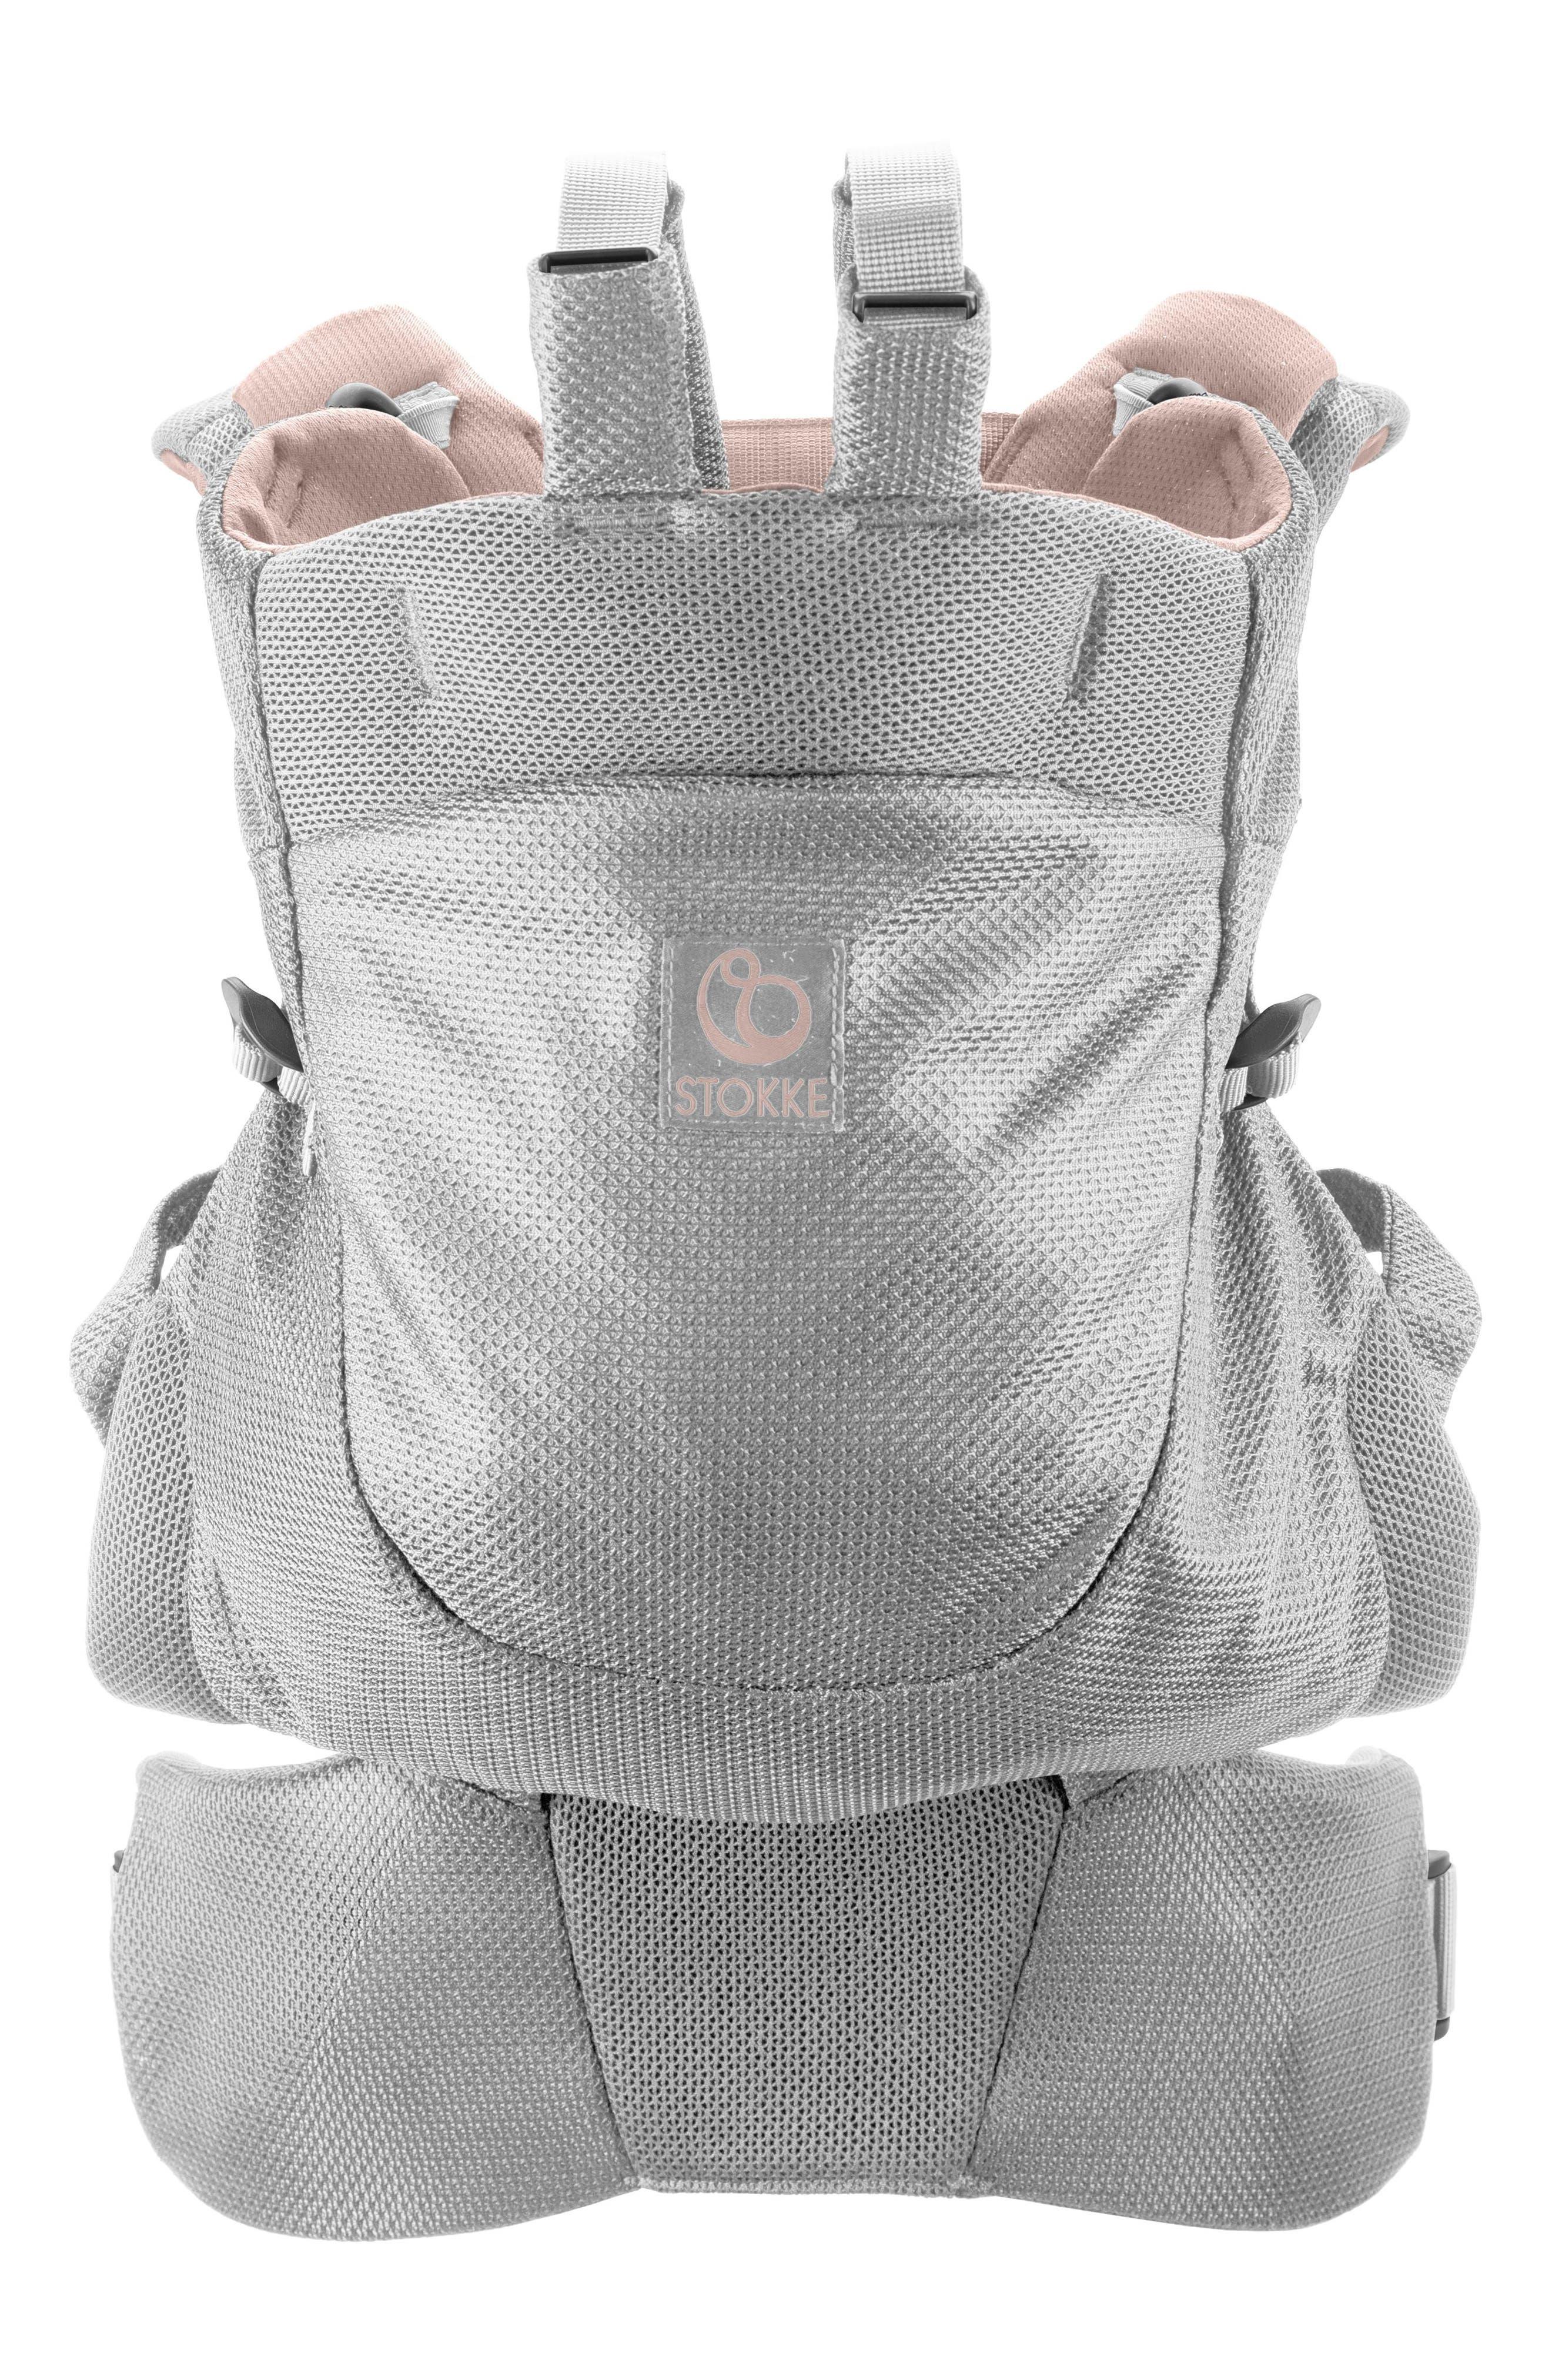 STOKKE, MyCarrier Front/Back Baby Carrier, Main thumbnail 1, color, PINK MESH